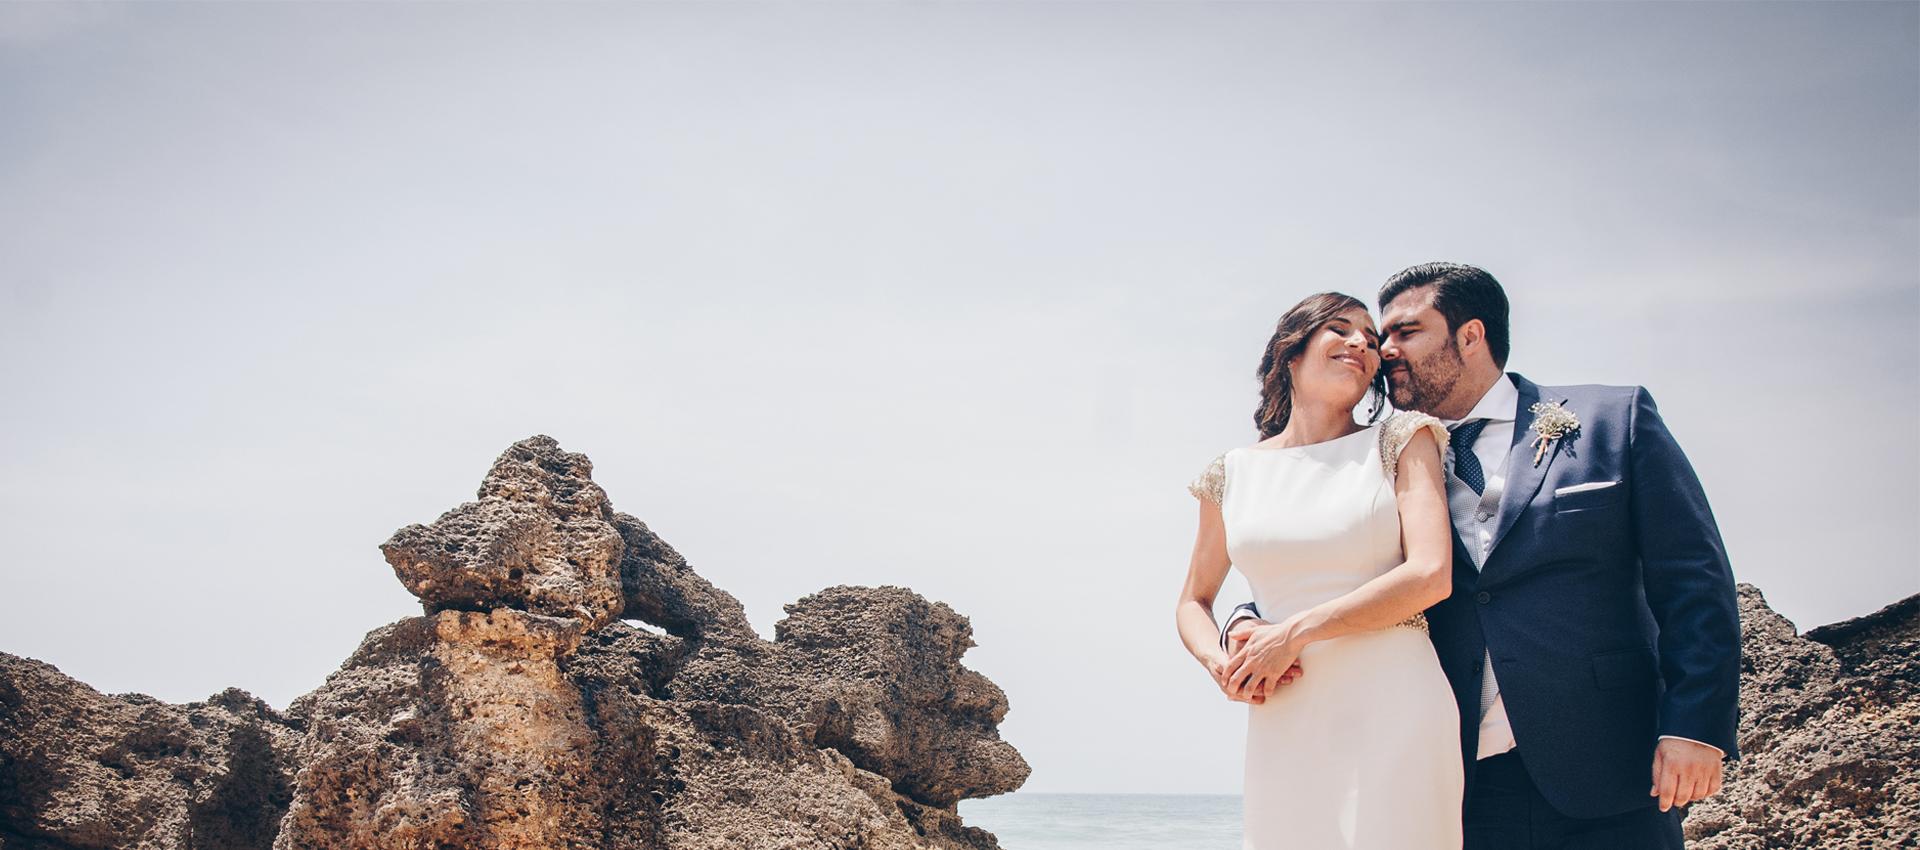 Gema-PacoPortada Inicio - video boda cadiz